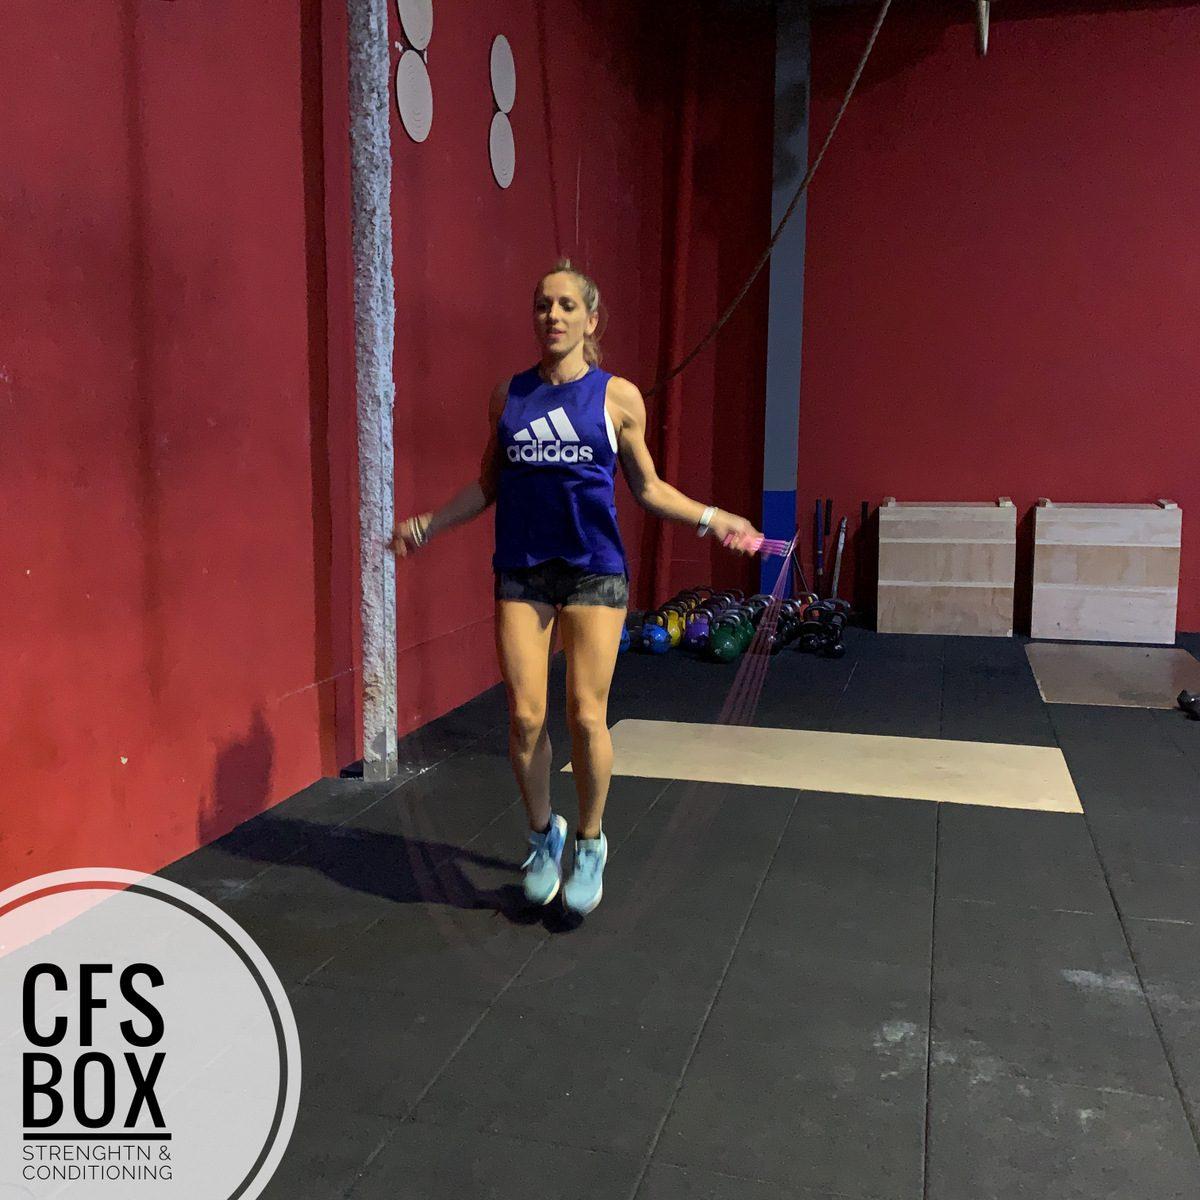 Wor CFS Box CrossFit Sevilla training lions